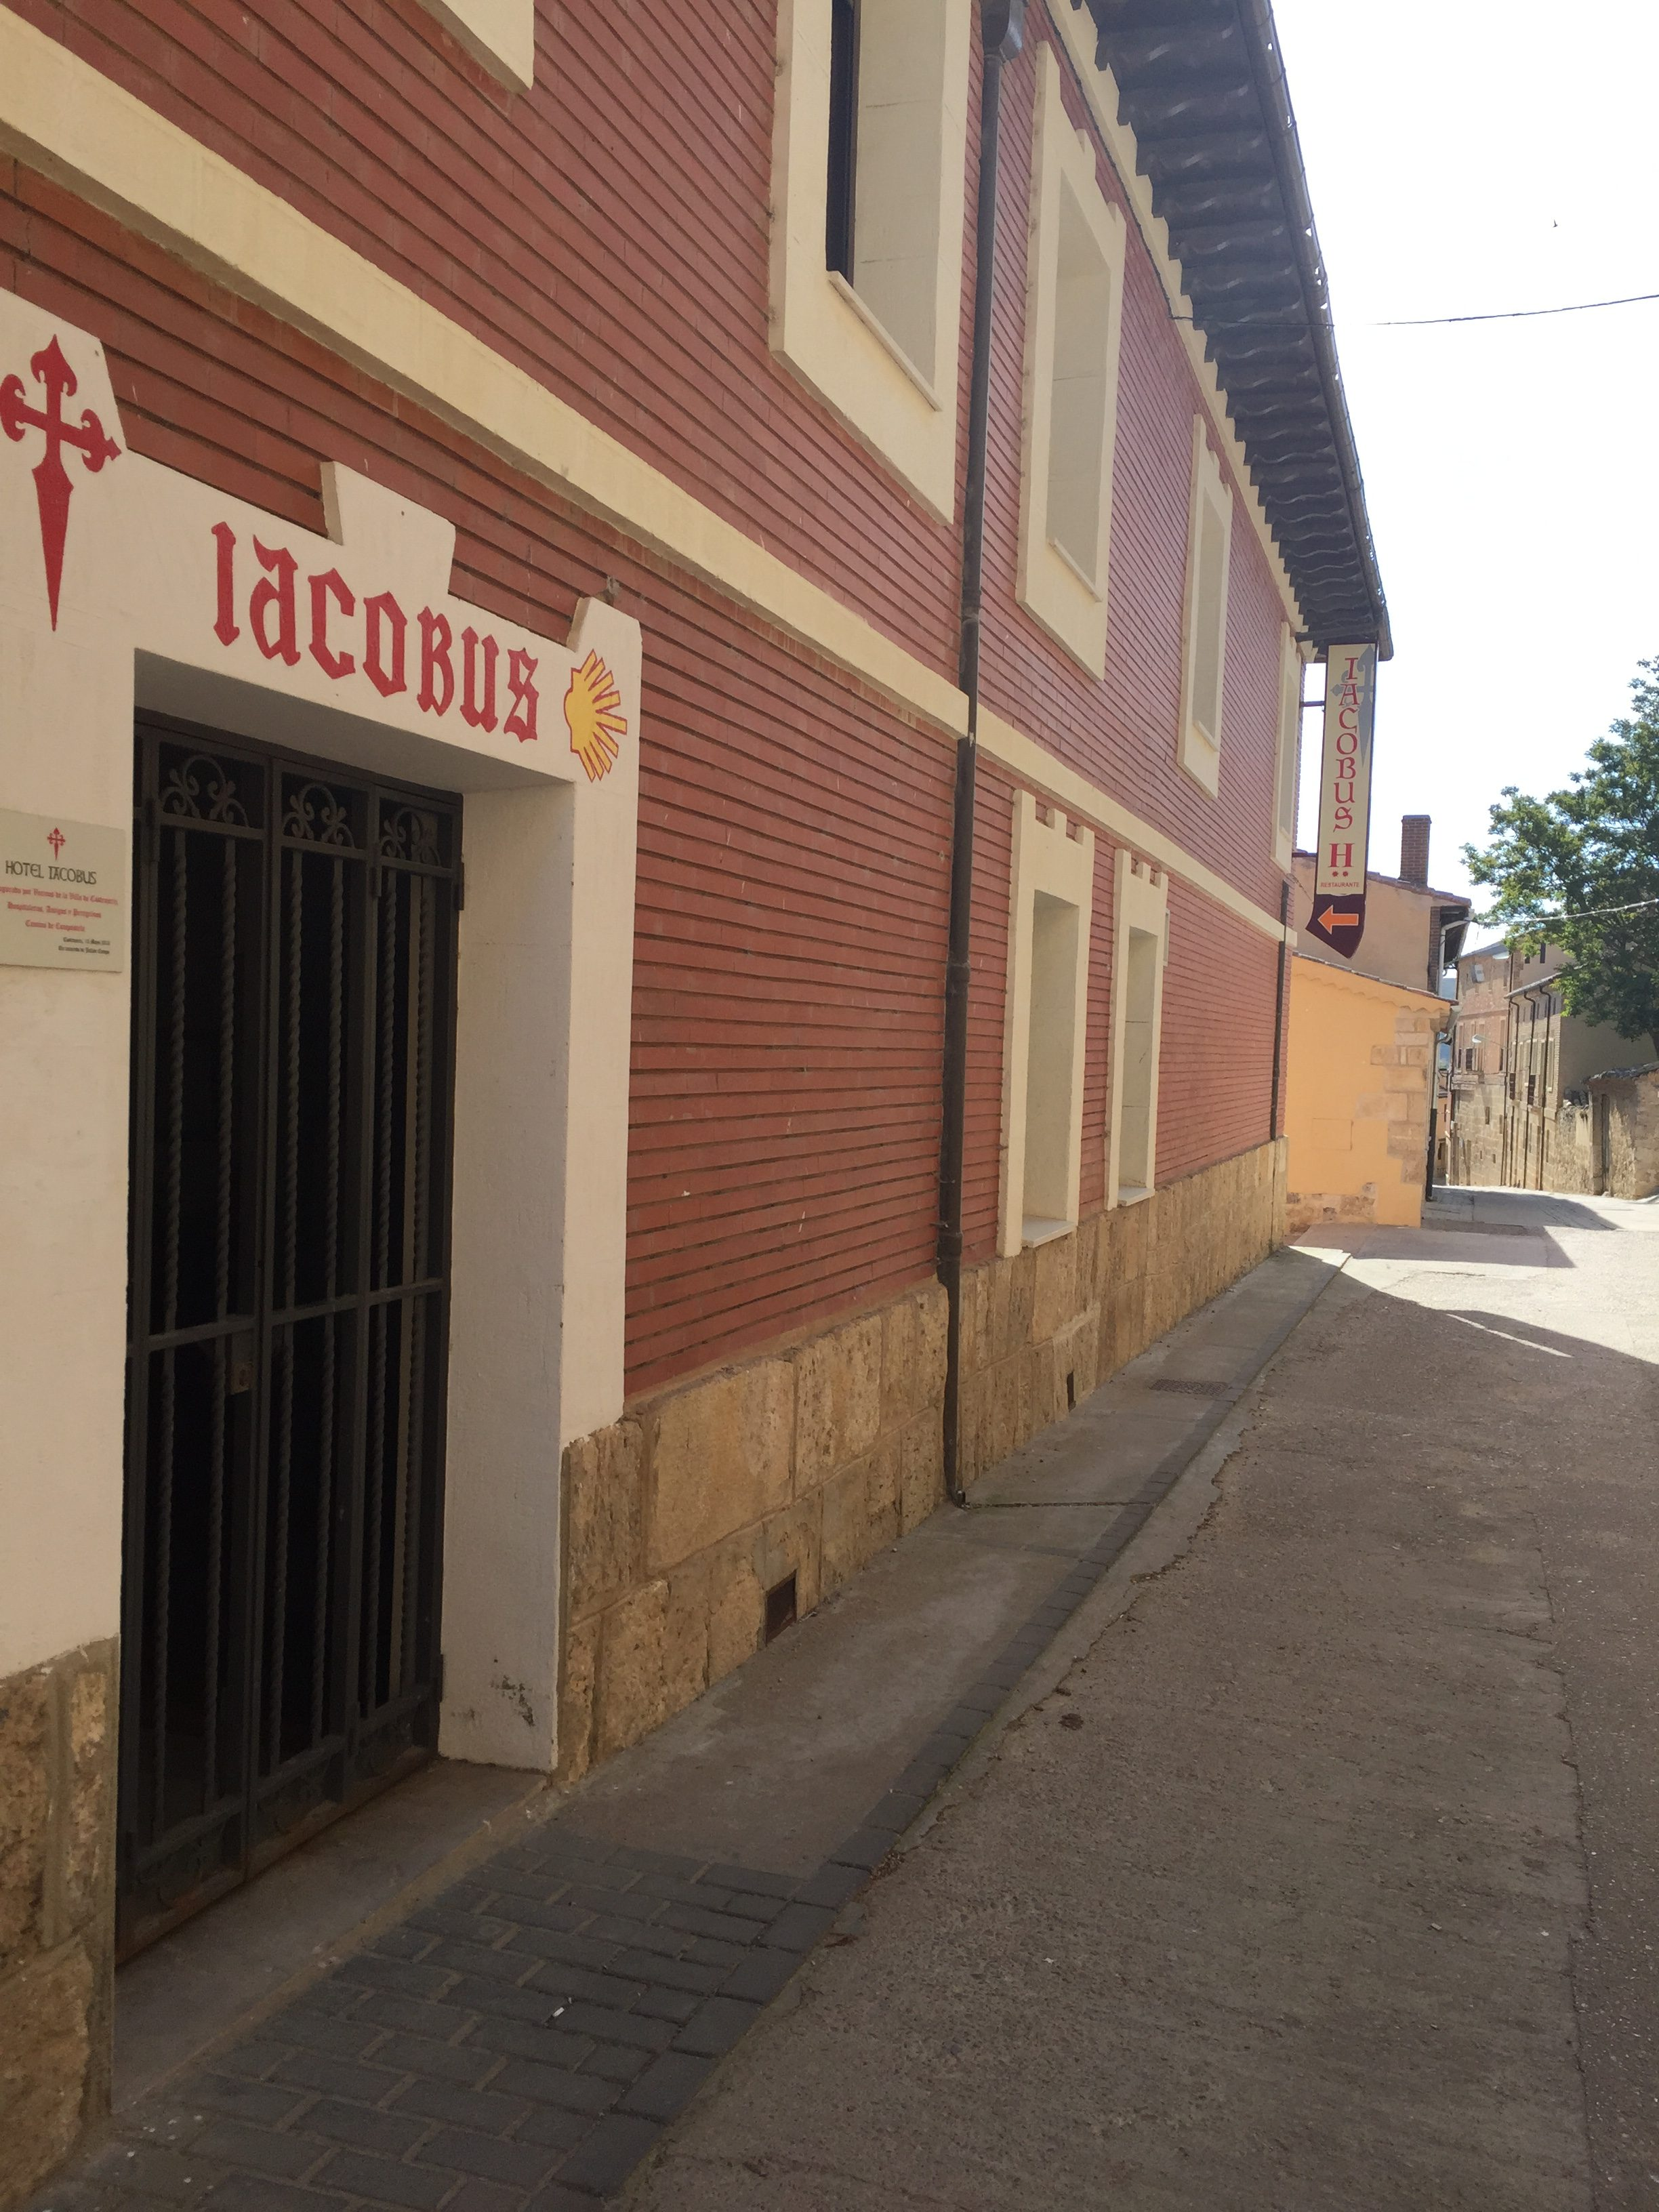 Iacobus, Castrojeriz, Spain